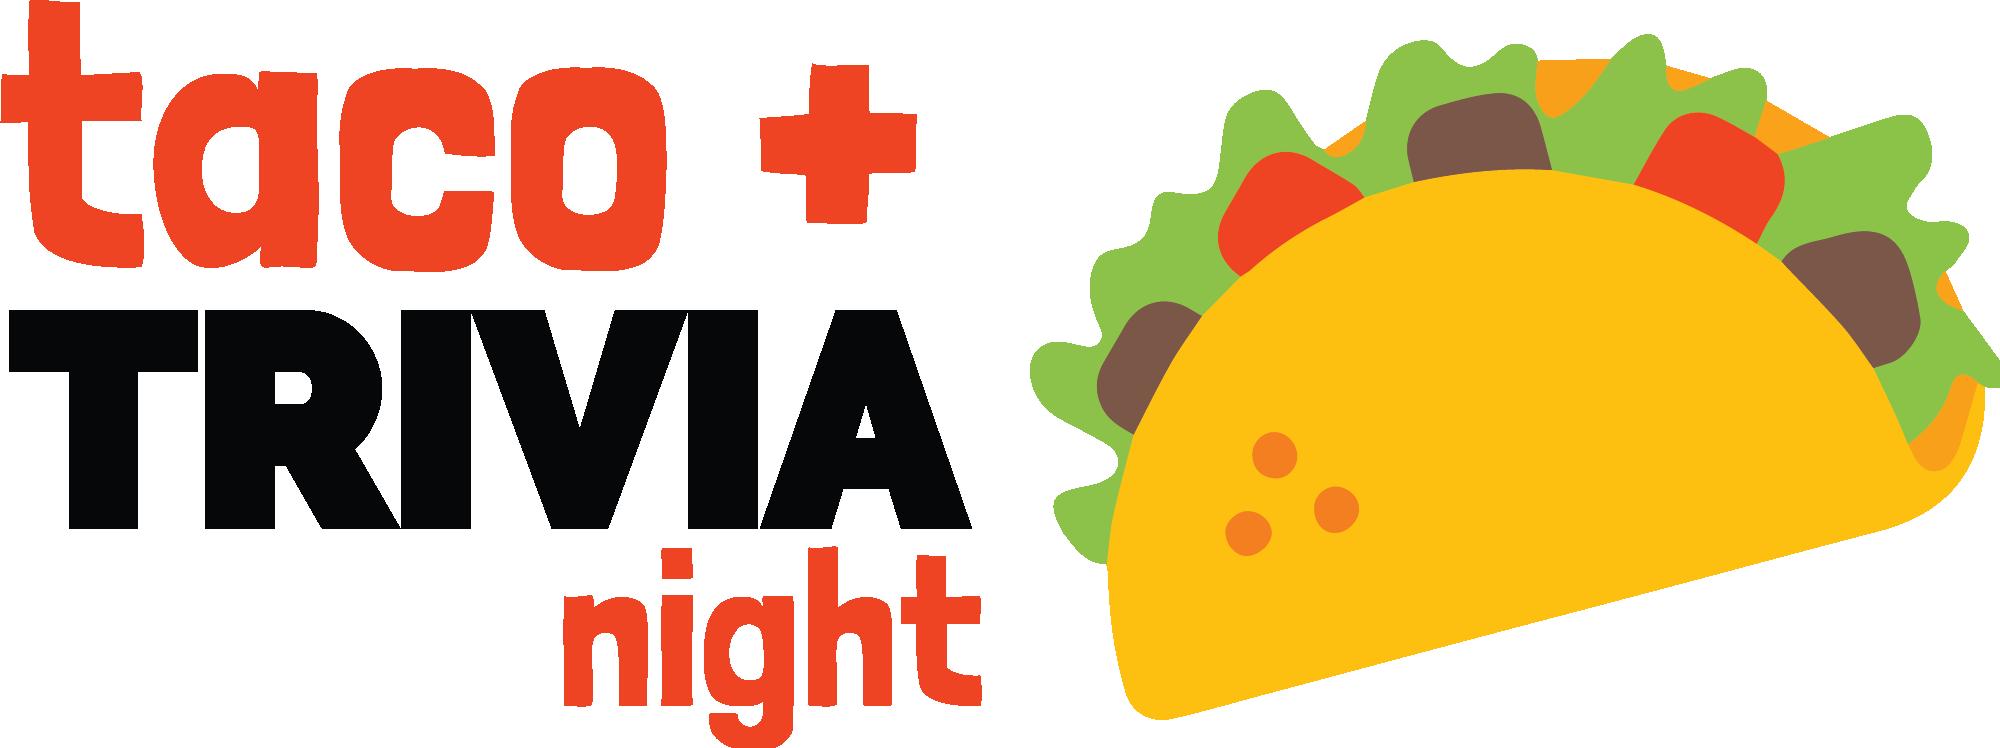 Tacos clipart taco night.  trivia d education